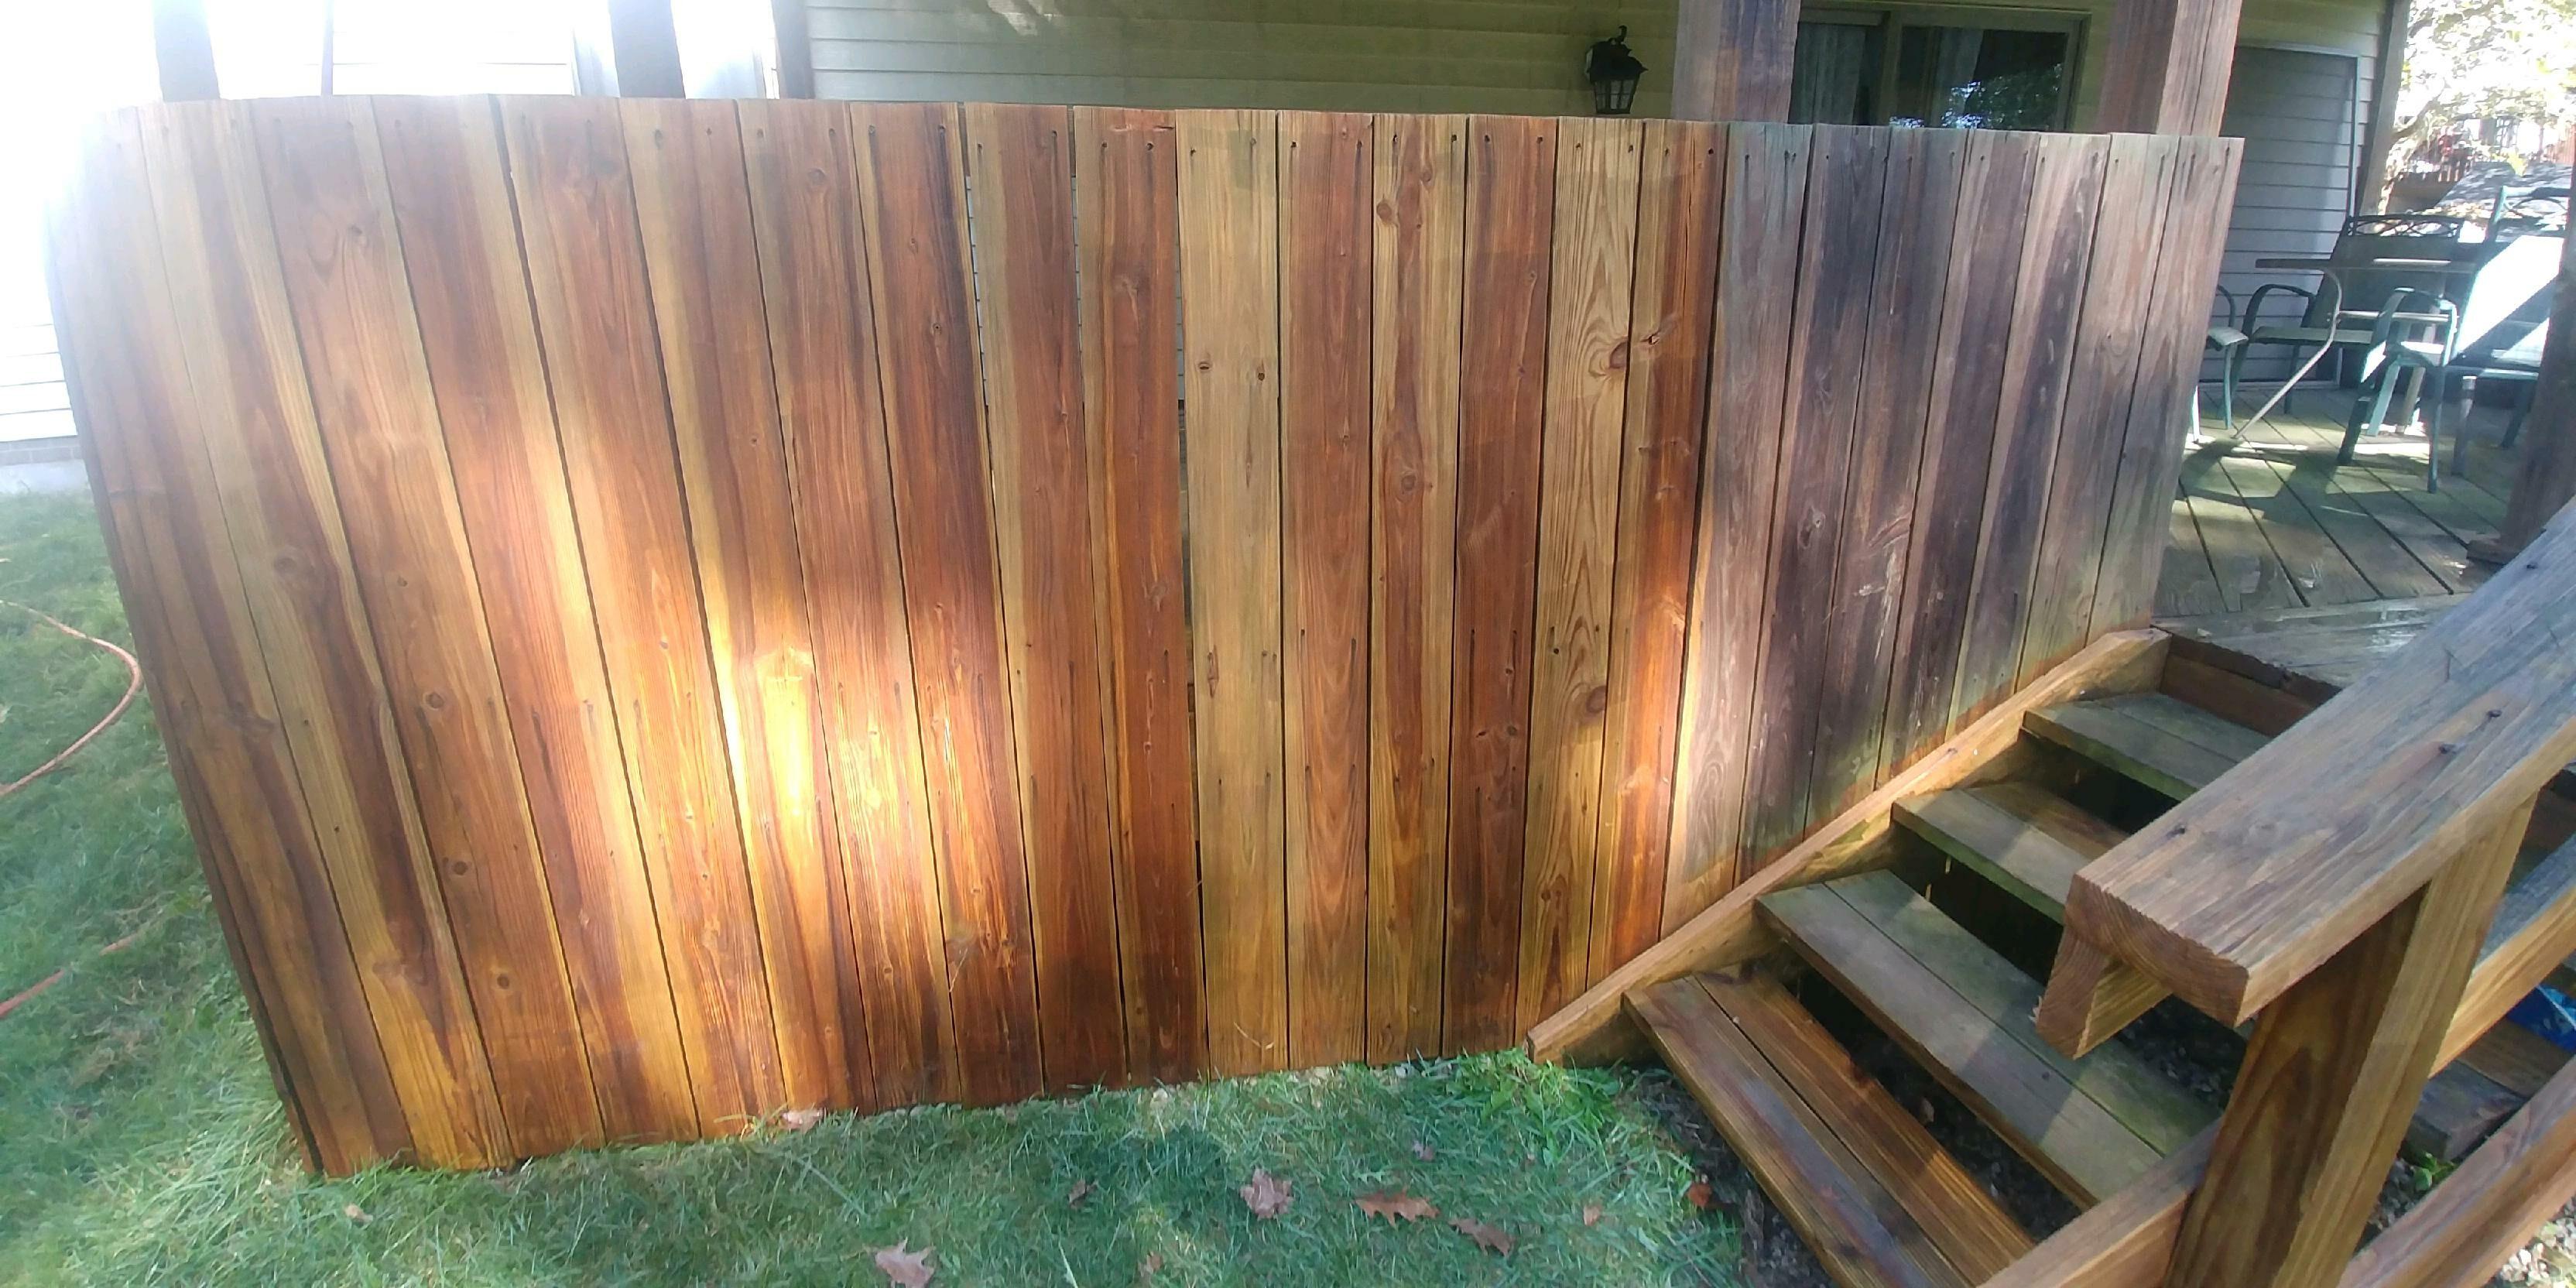 twinsburg-fence-refinish